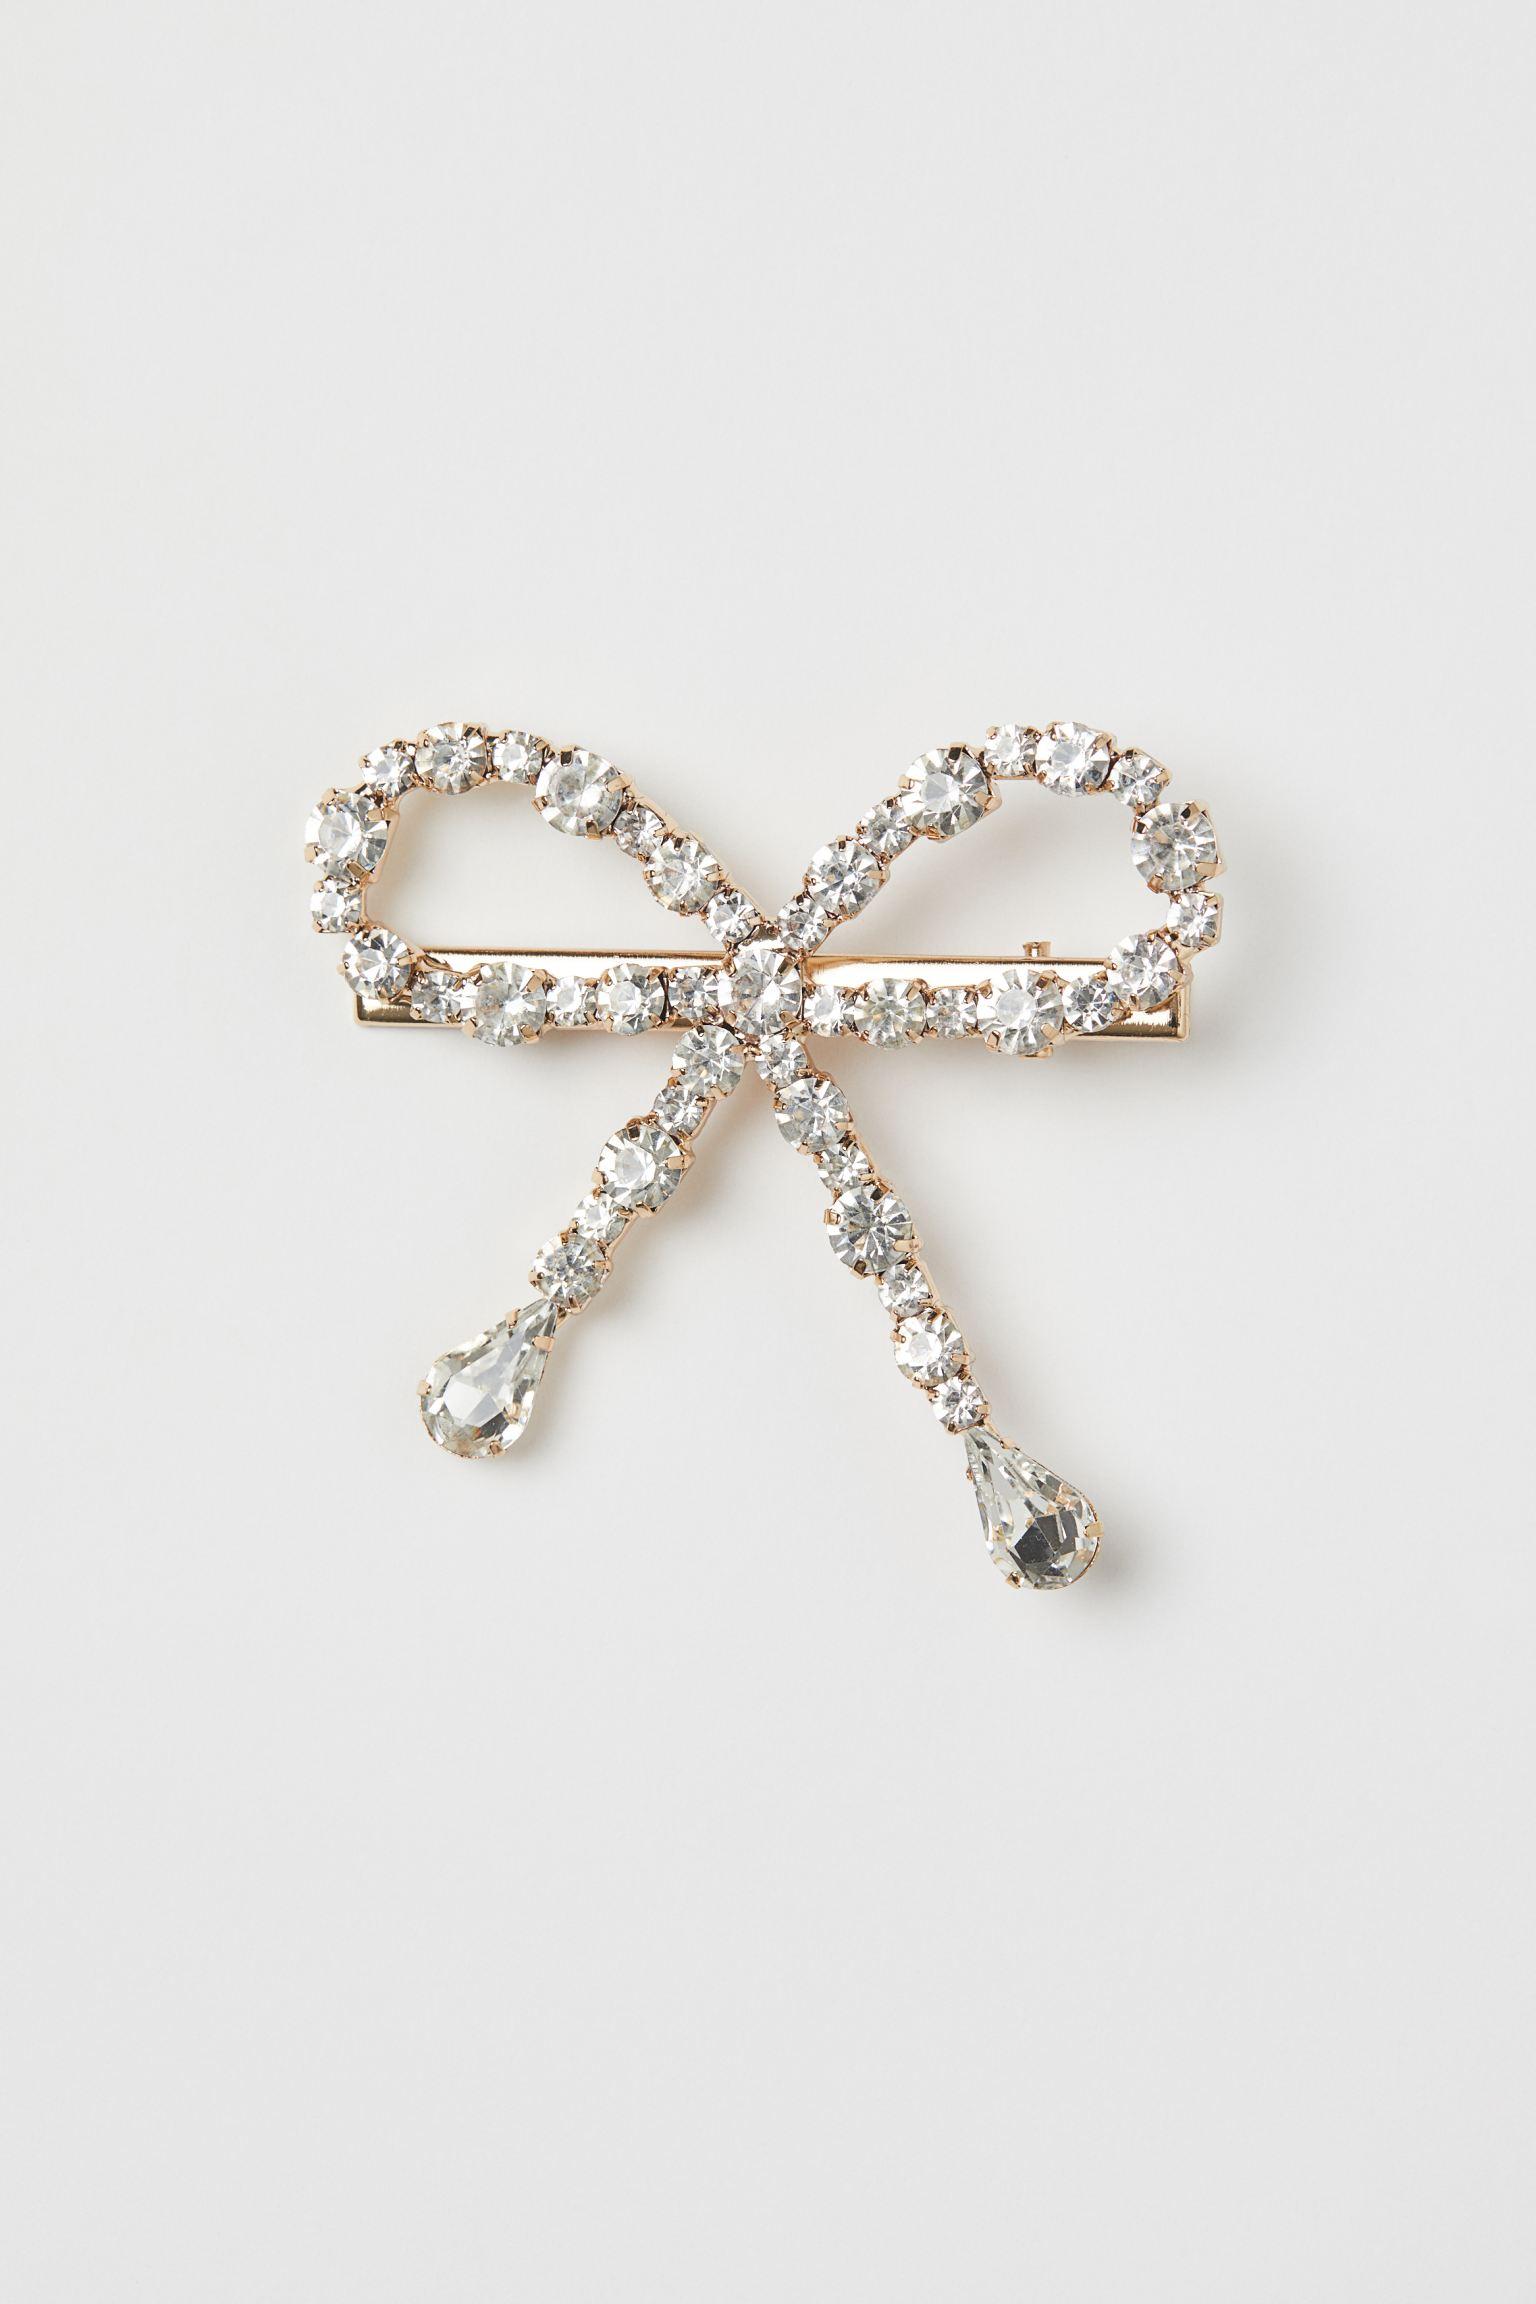 Pinza de metal con lazo decorado con strass.